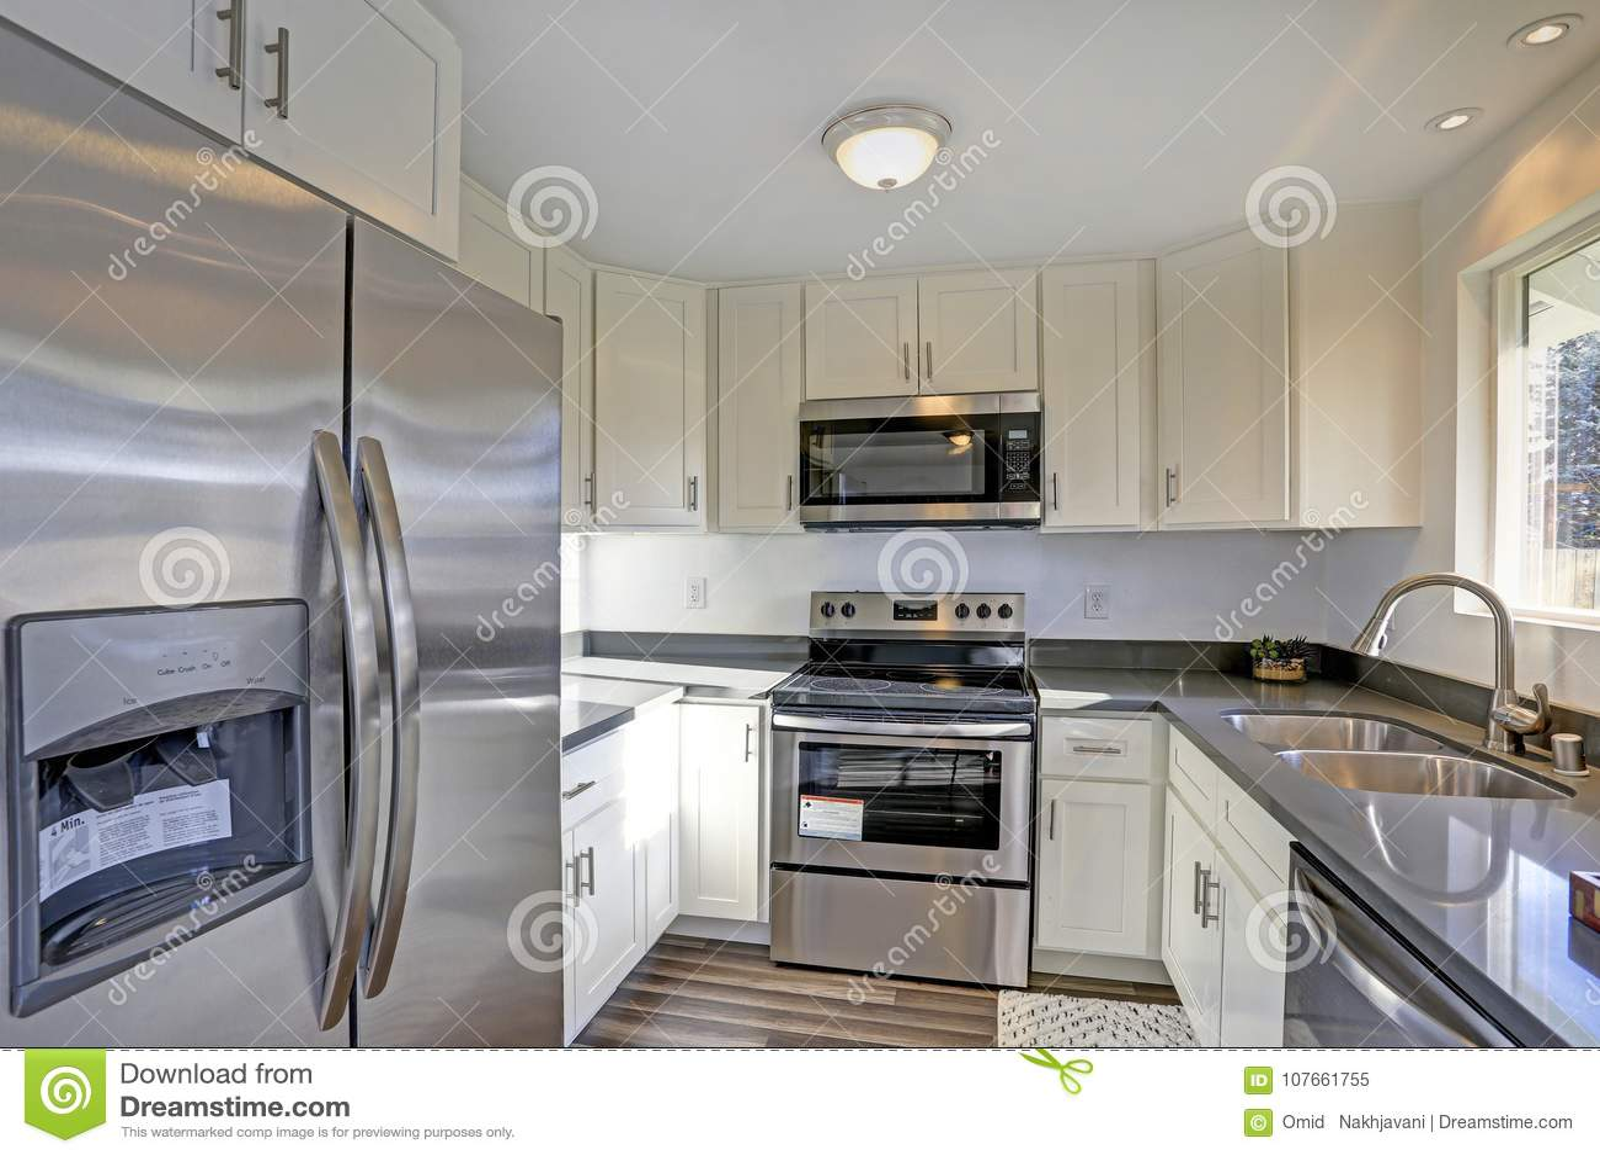 compact kitchens kitchen appliance suite 点燃被填装的家庭内部特点小紧凑厨房库存图片 图片包括有厨房 火炉 点燃有白色内阁和现代不锈钢装置的被填装的家庭内部特点小紧凑厨房